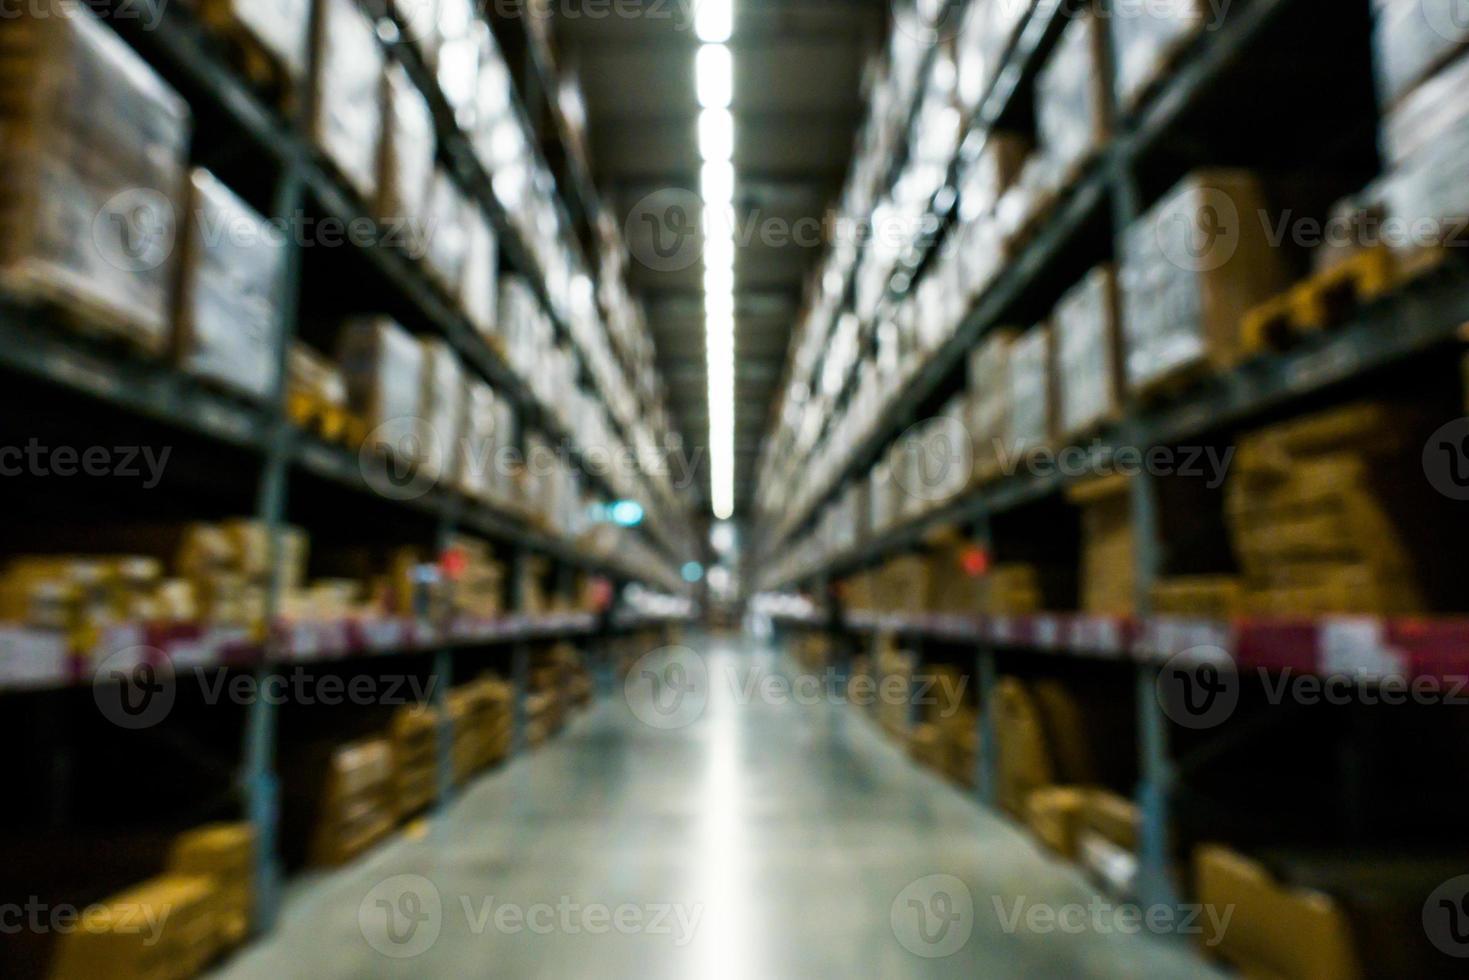 Blurry warehouse background photo